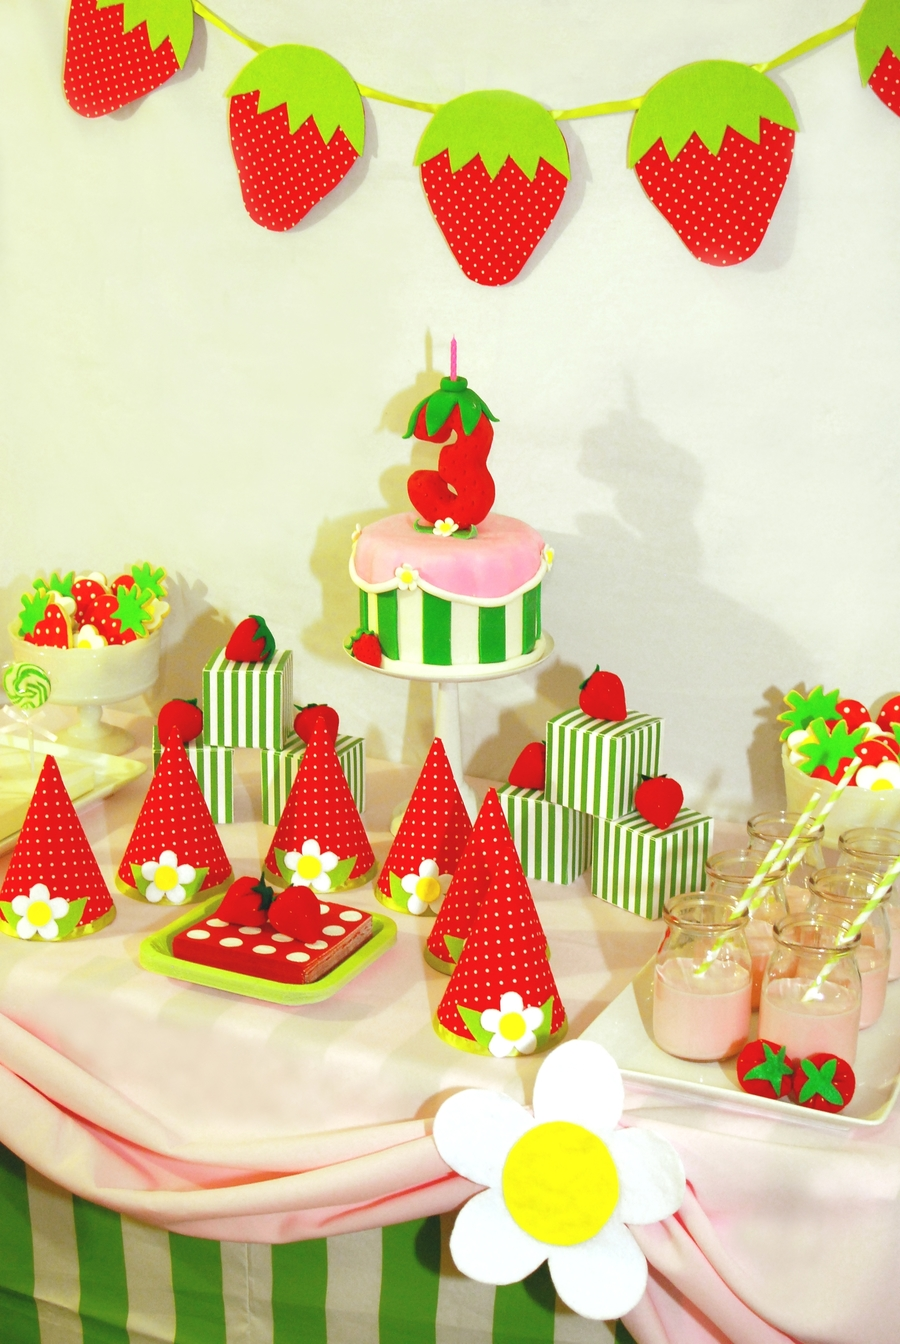 Strawberry shortcake birthday cake and dessert table - Decoraciones para cumpleanos infantiles ...